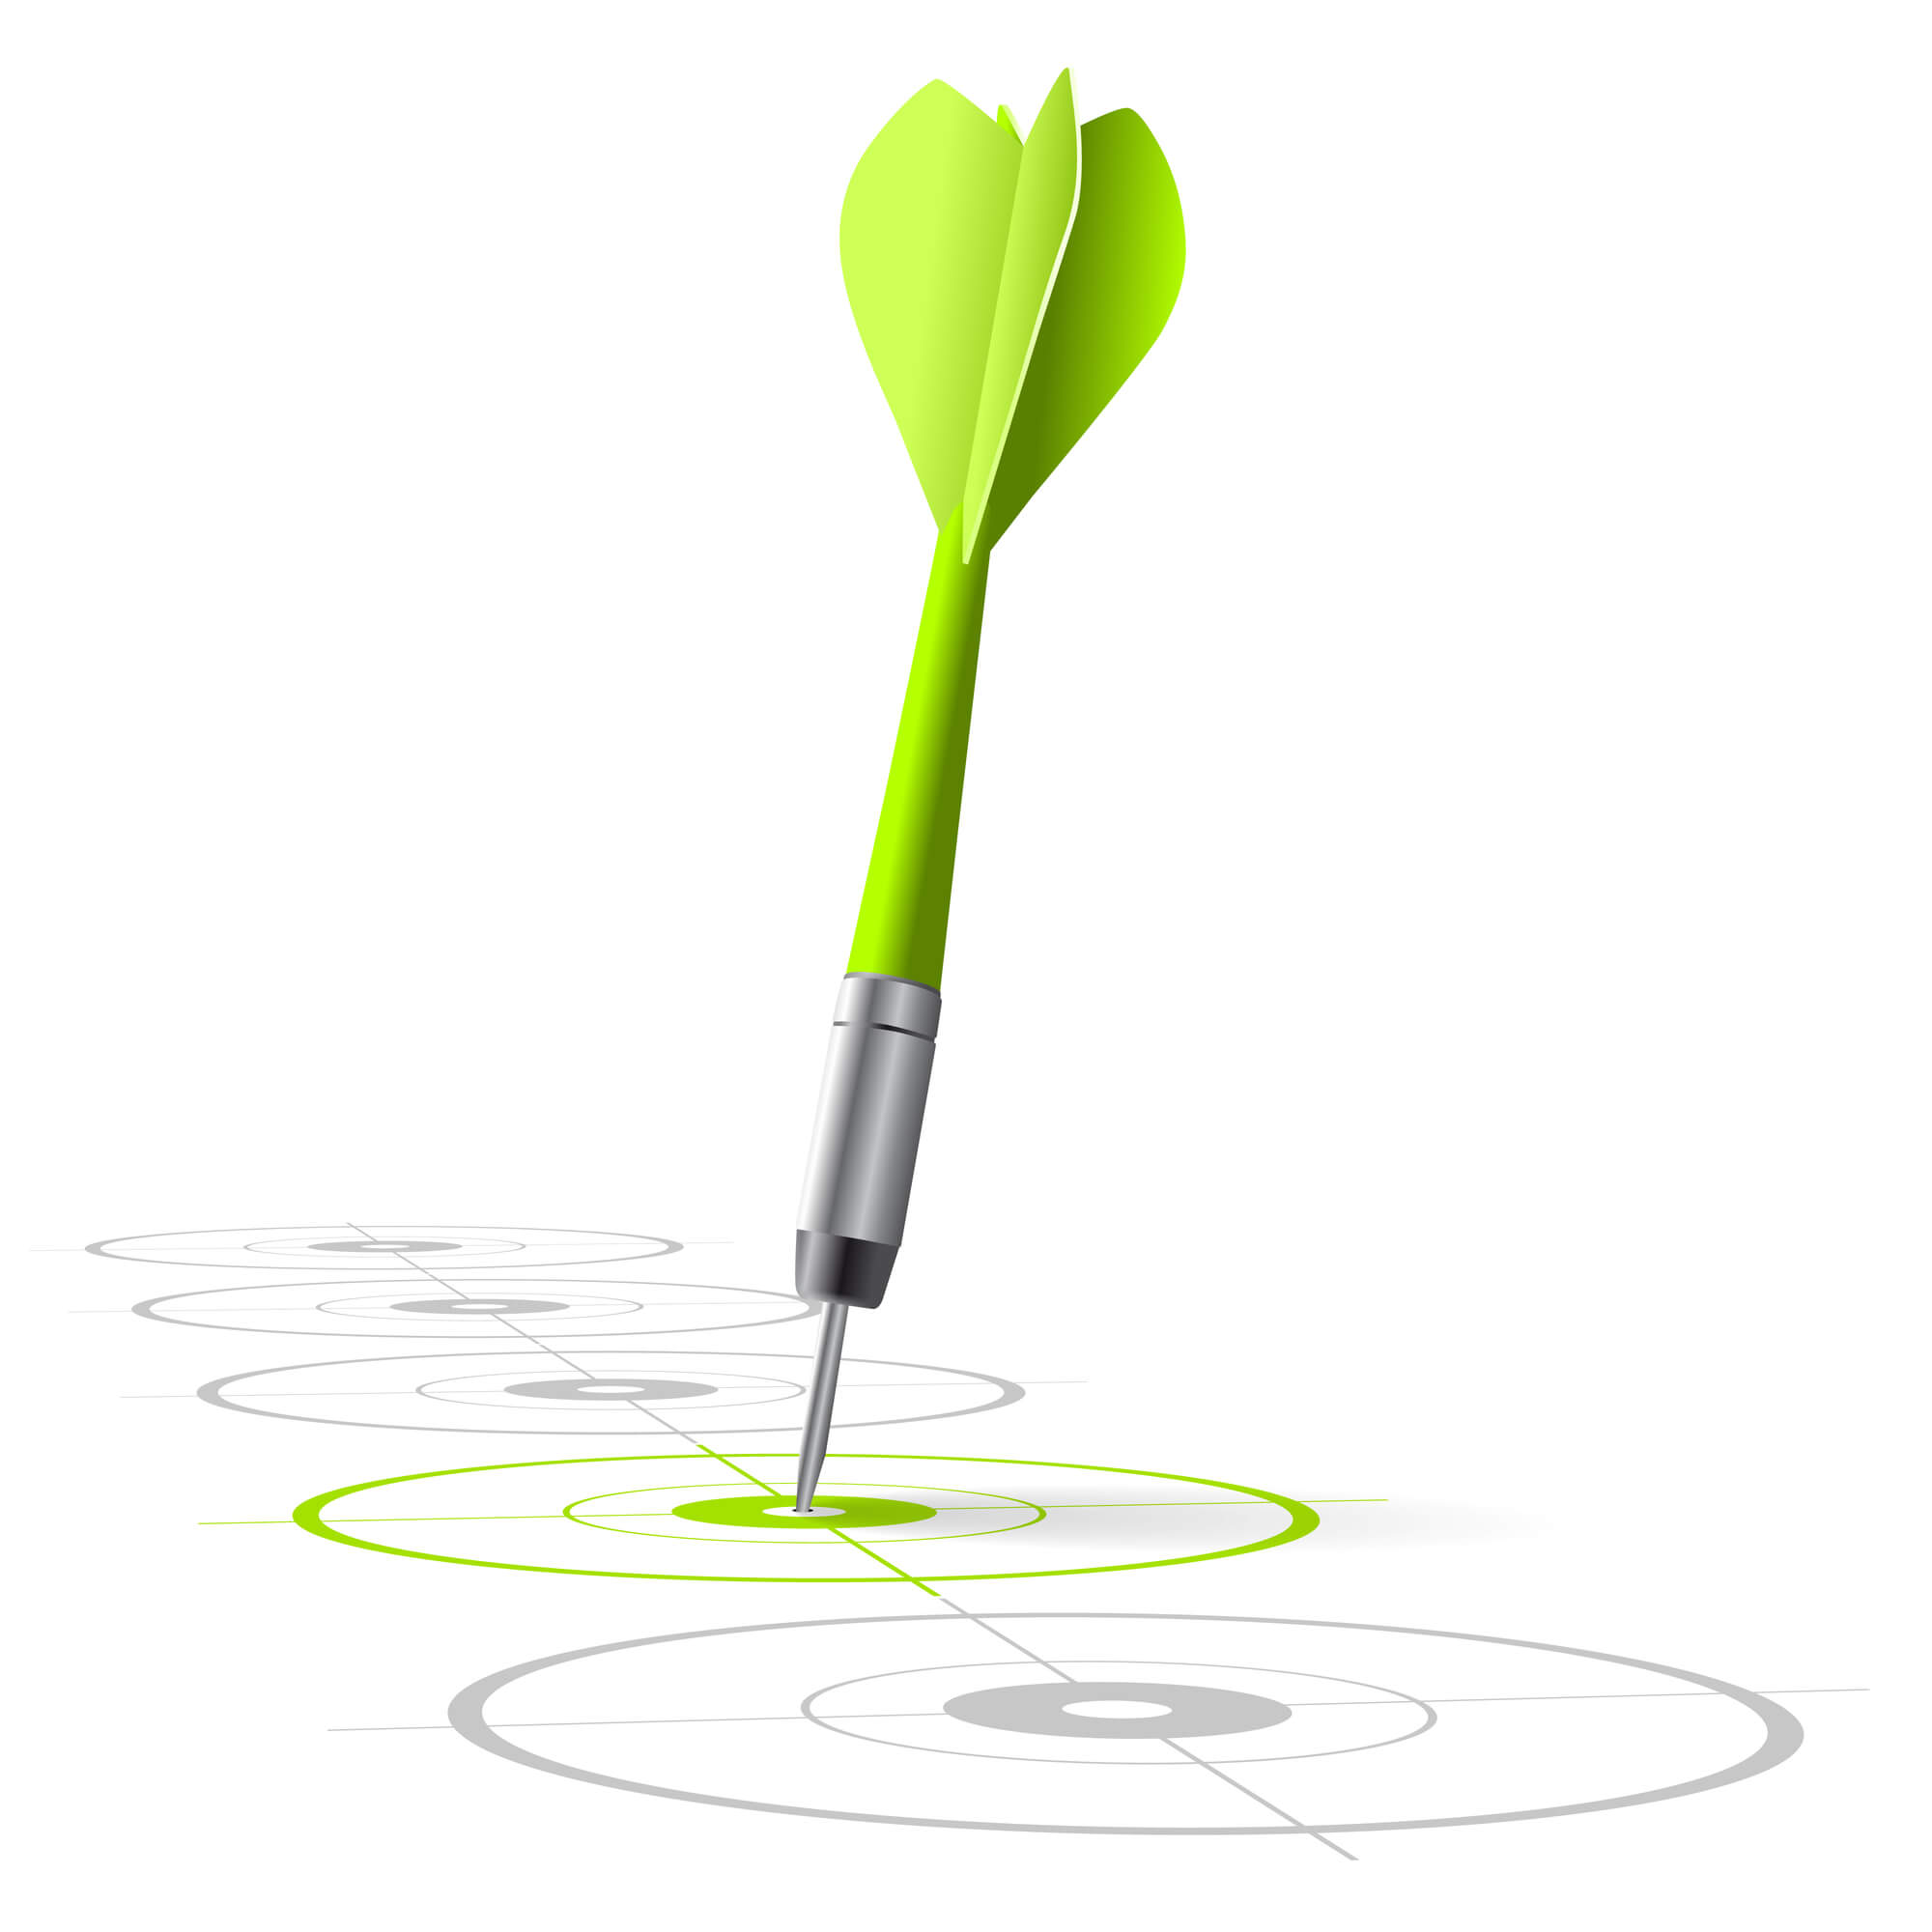 Green dart hitting a target